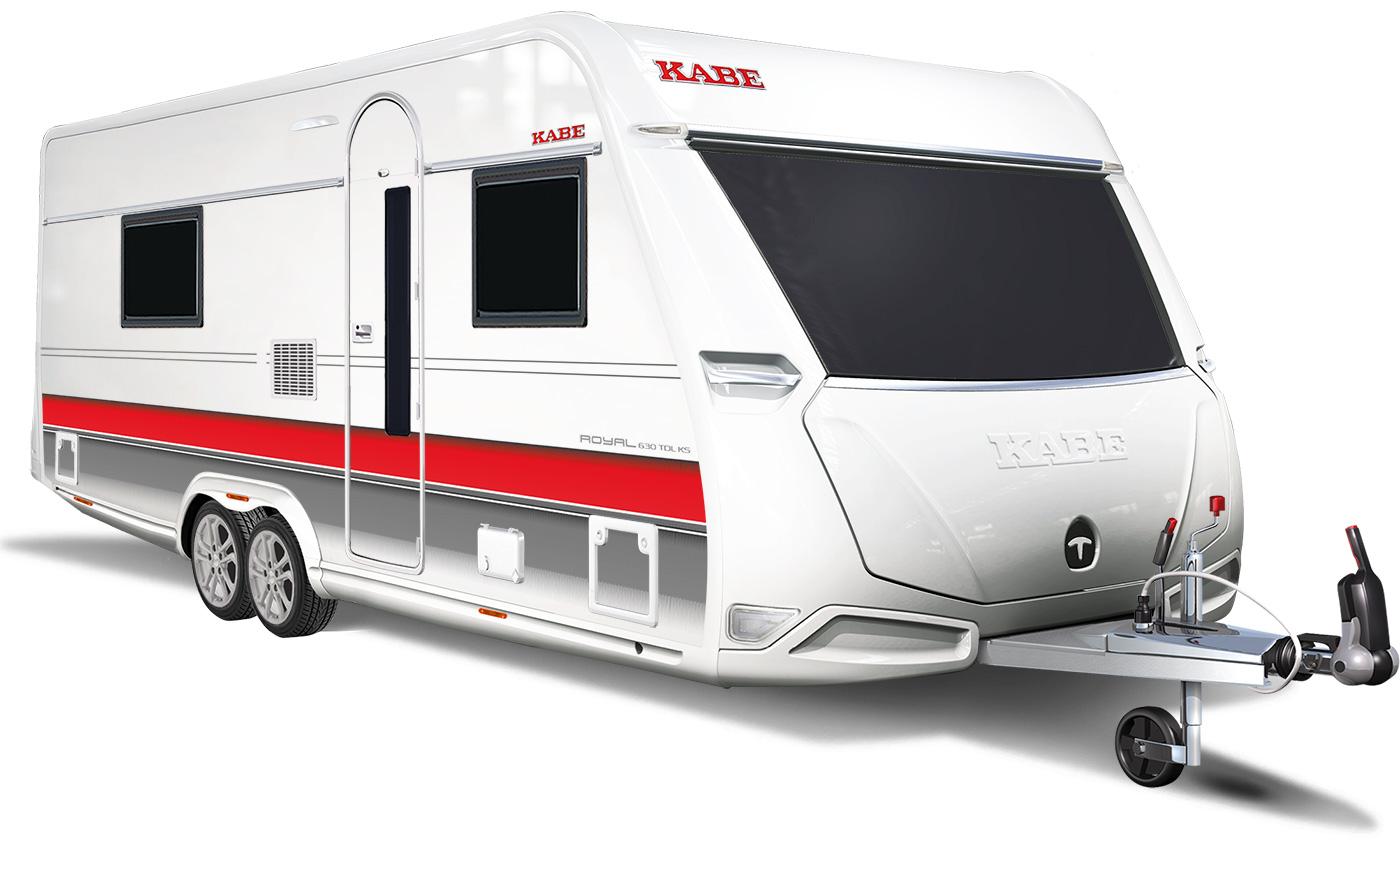 Kabe - Royal 630 TDL Tandem